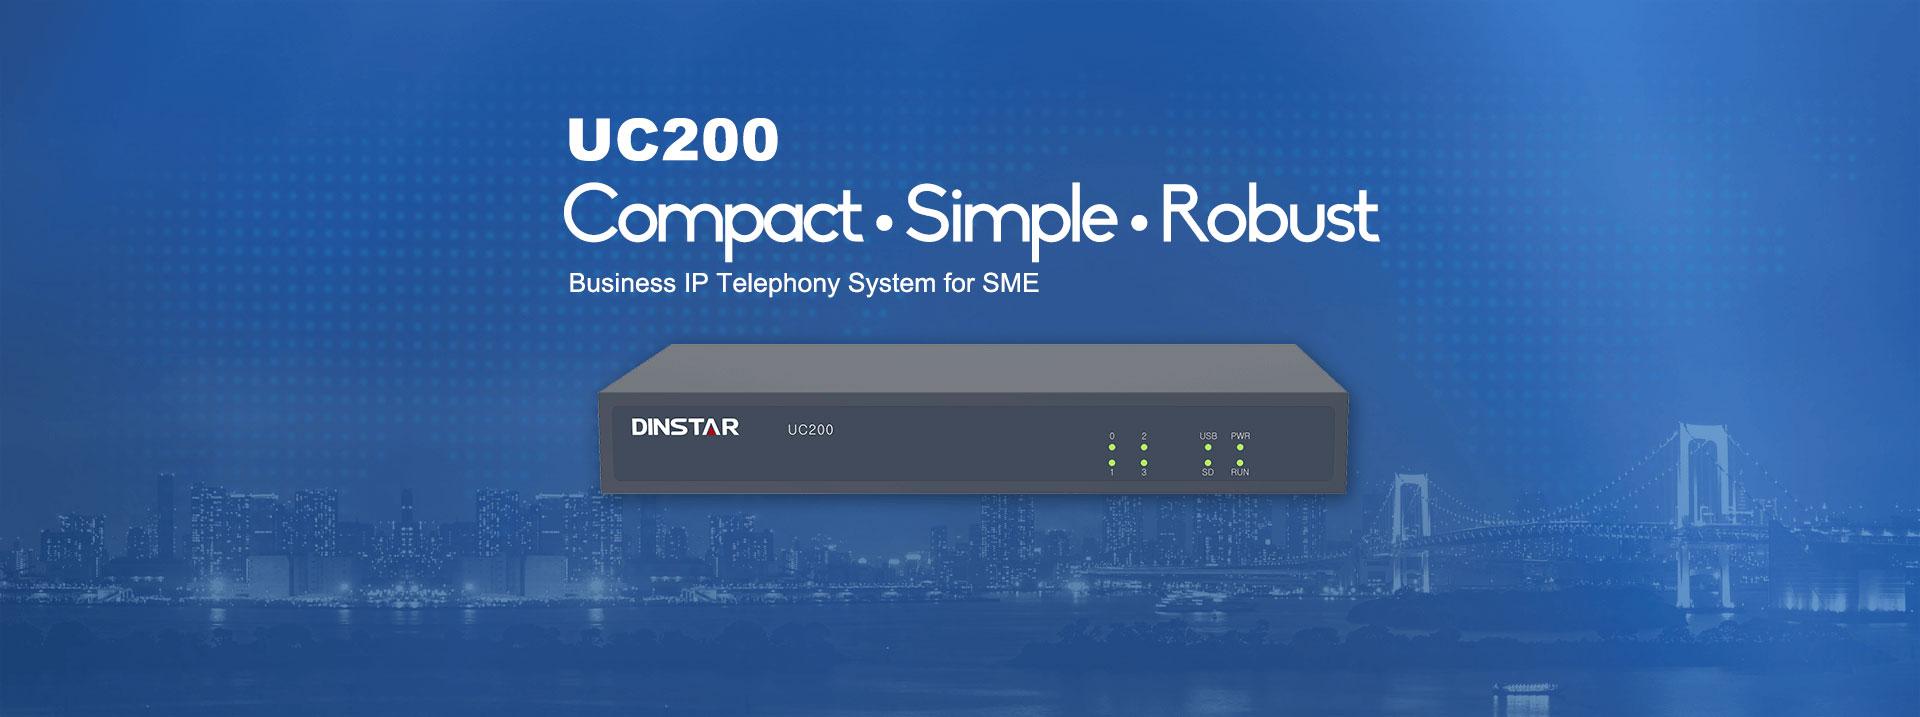 UC200-1